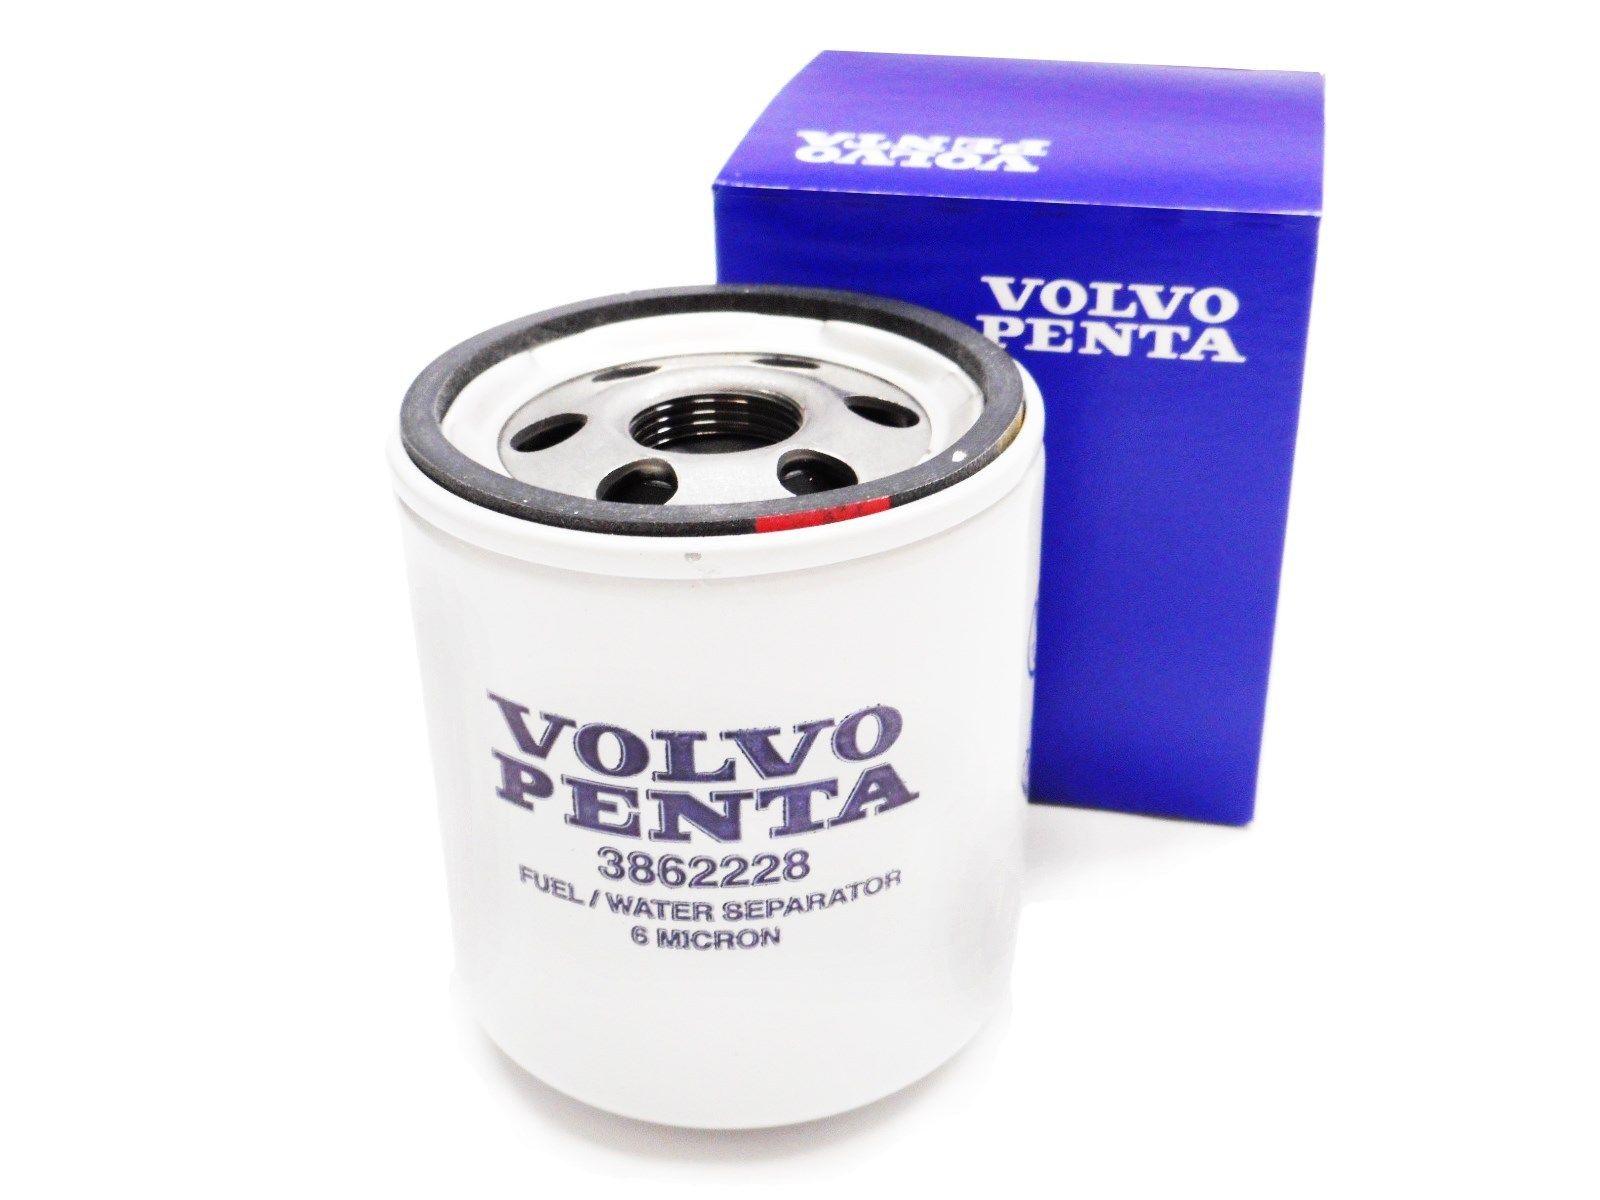 hight resolution of 3862228 volvo penta water separating fuel filter genuine oem ebay fuel filter